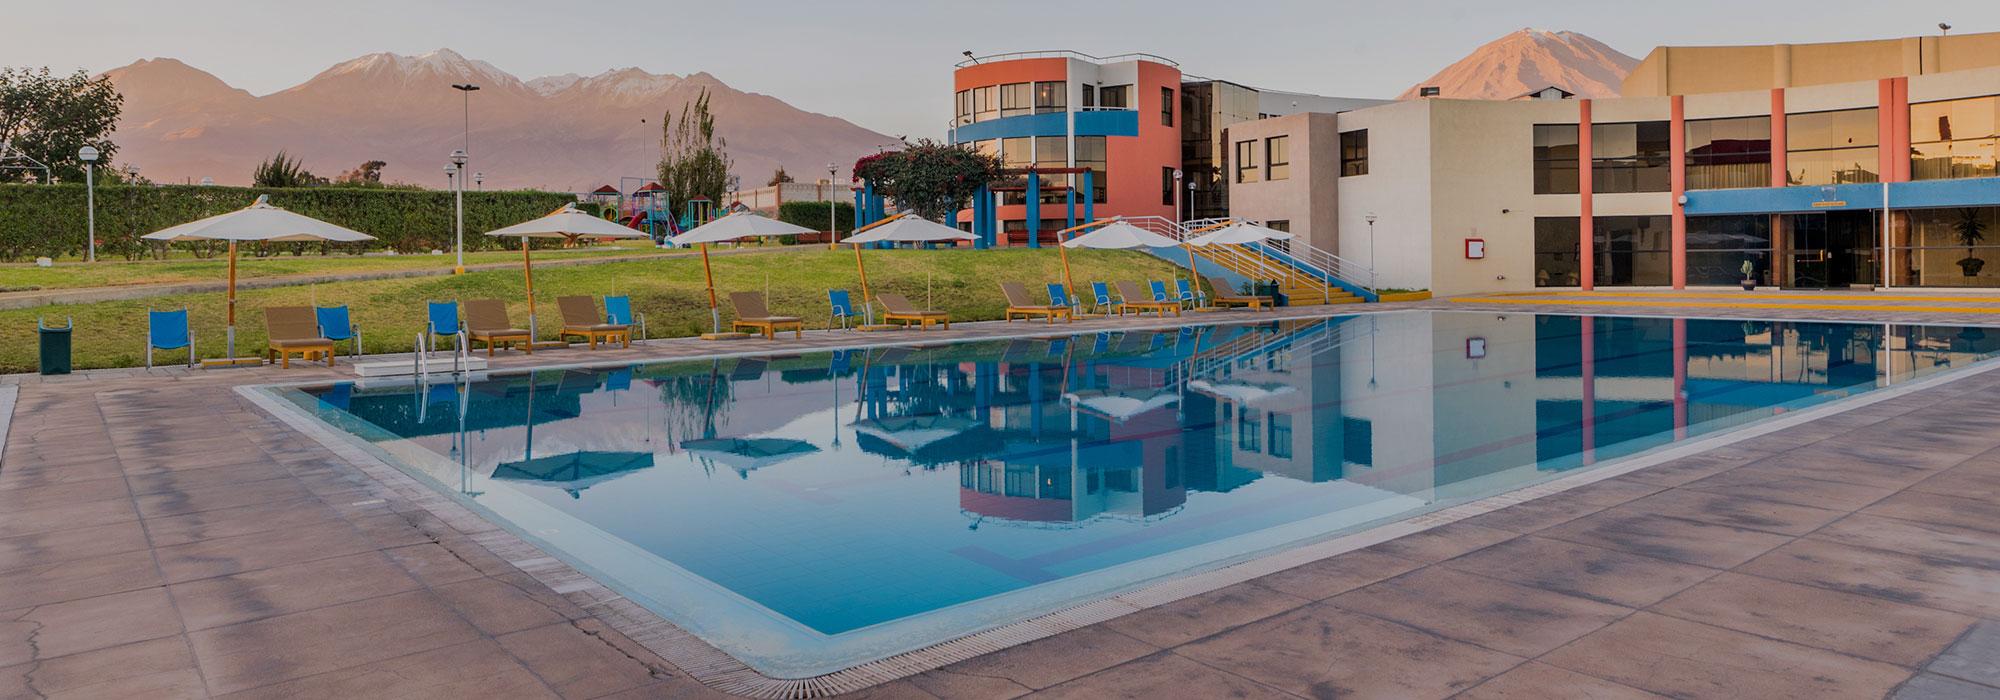 dm-hoteles-peru-arequipa-banner-home-0